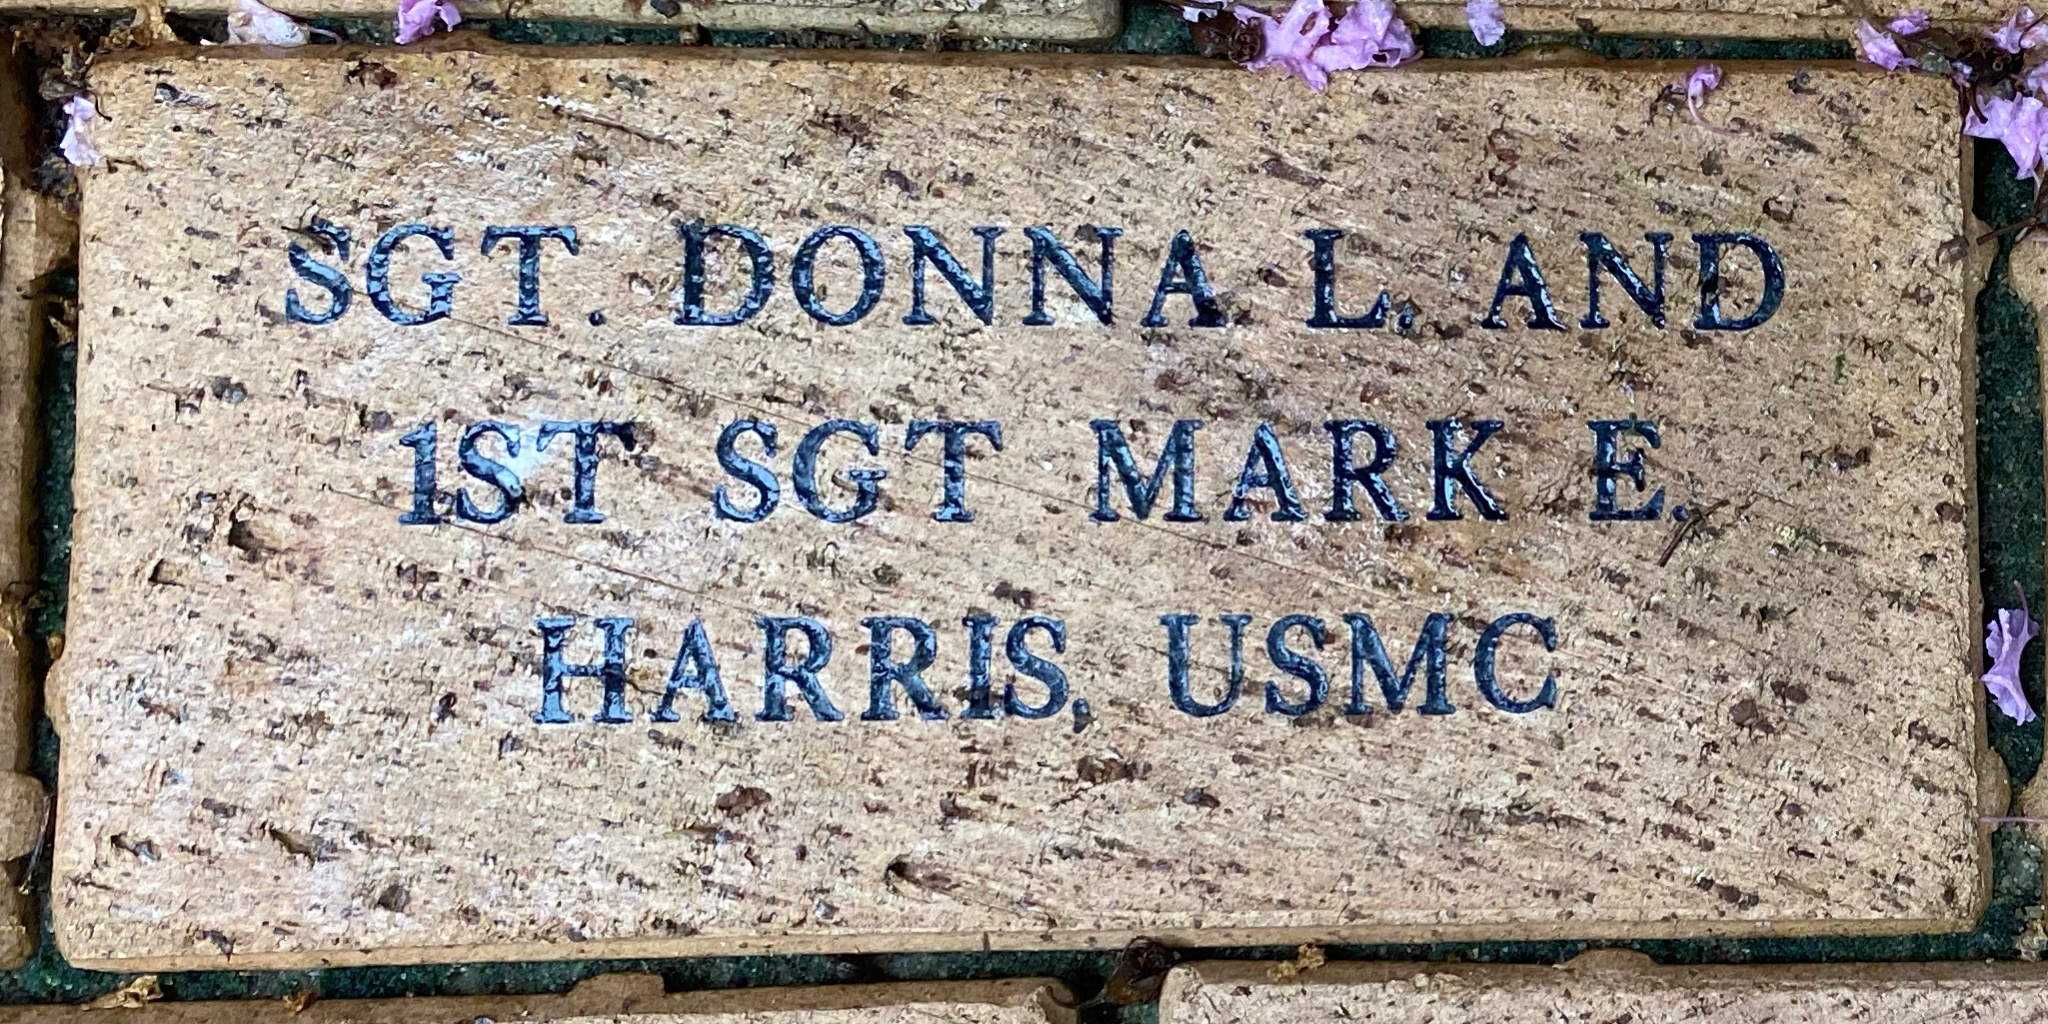 SGT DONNA L. AND 1ST SGT MARK E HARRIS, USMC